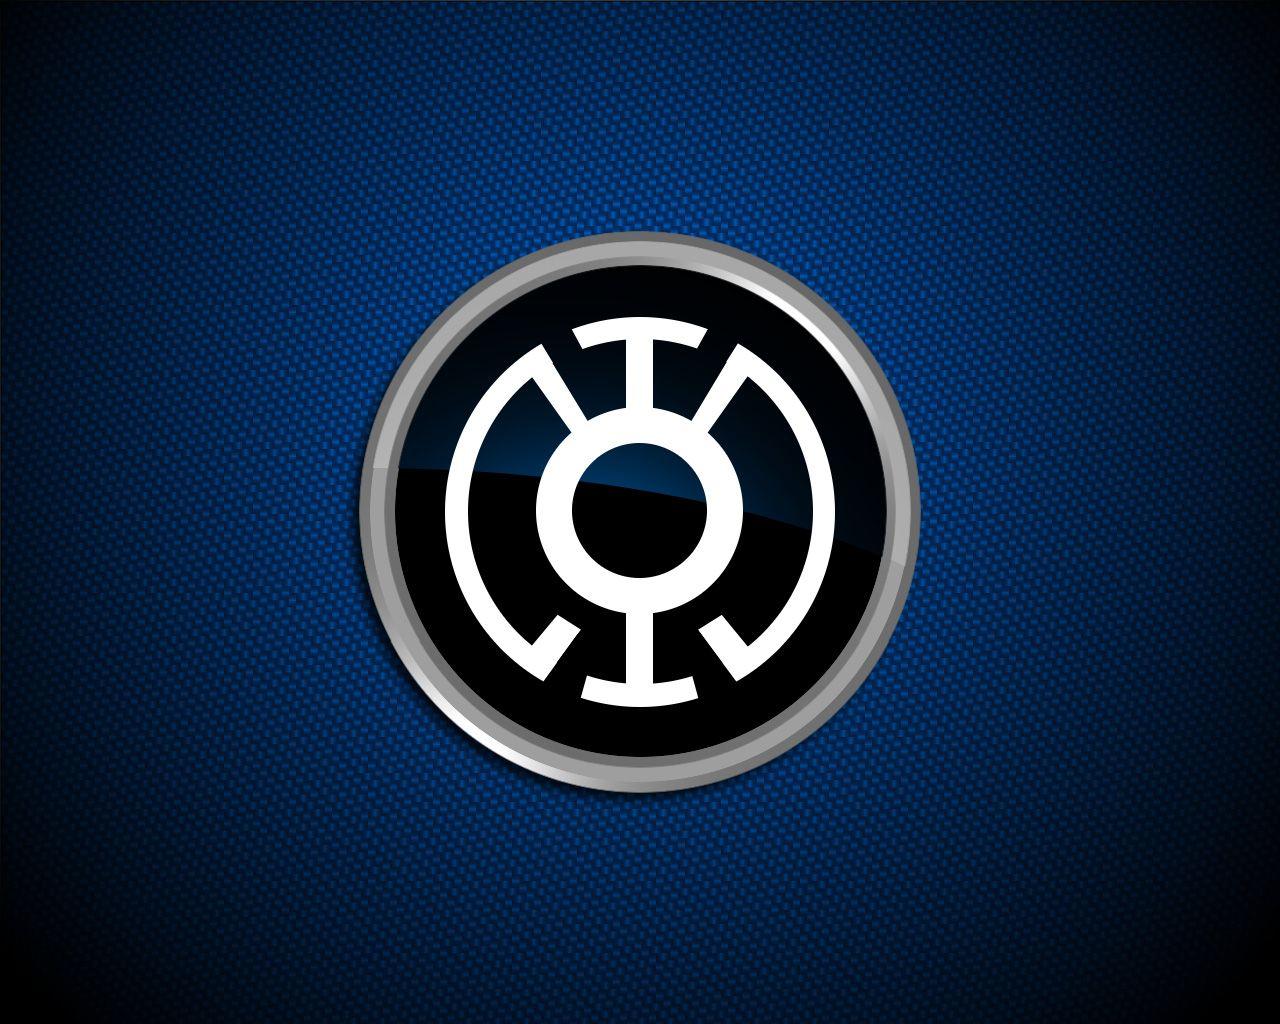 Blue Lantern Symbol Hope Burns Bright Nerd Stoof Pinterest